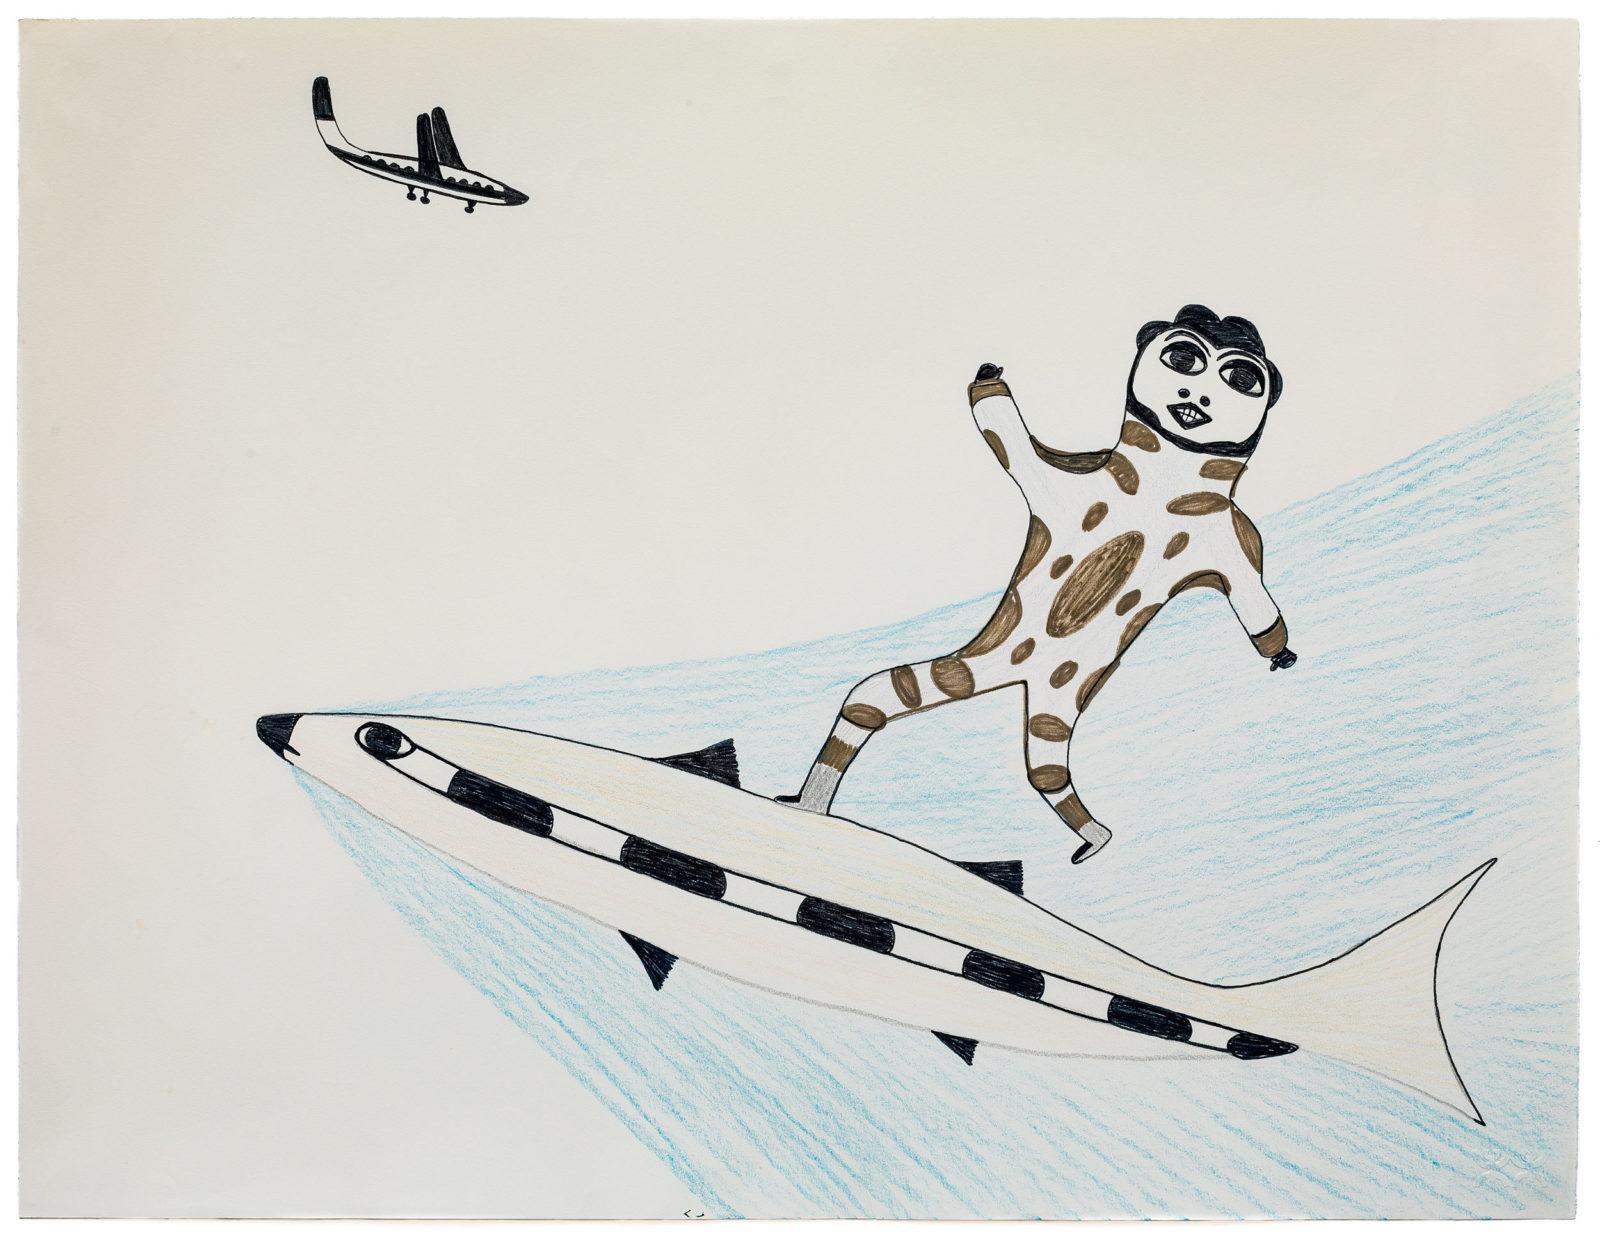 Pudlo Pudlat - untitled (man surfing on fish)